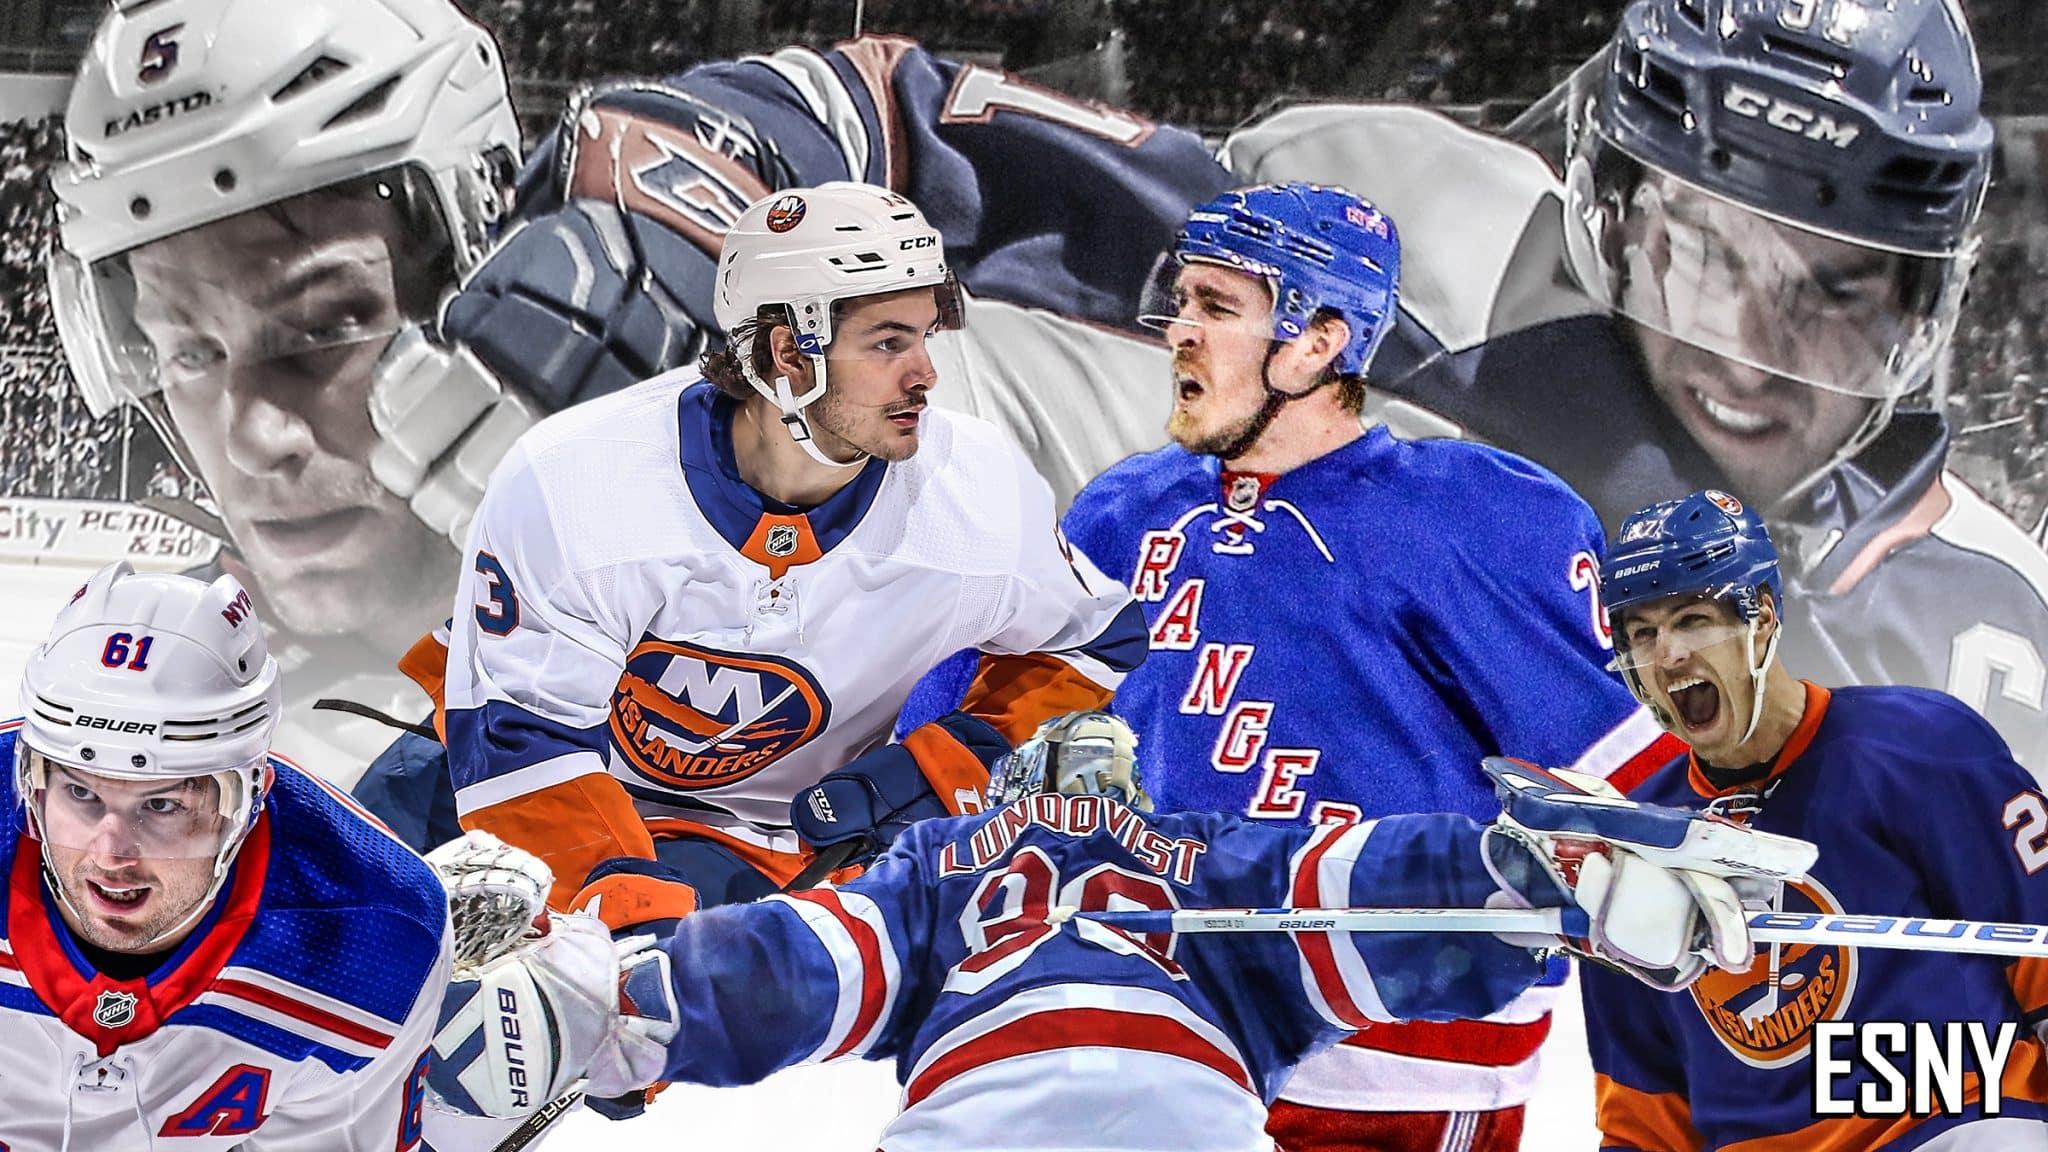 New York Rangers, Islanders